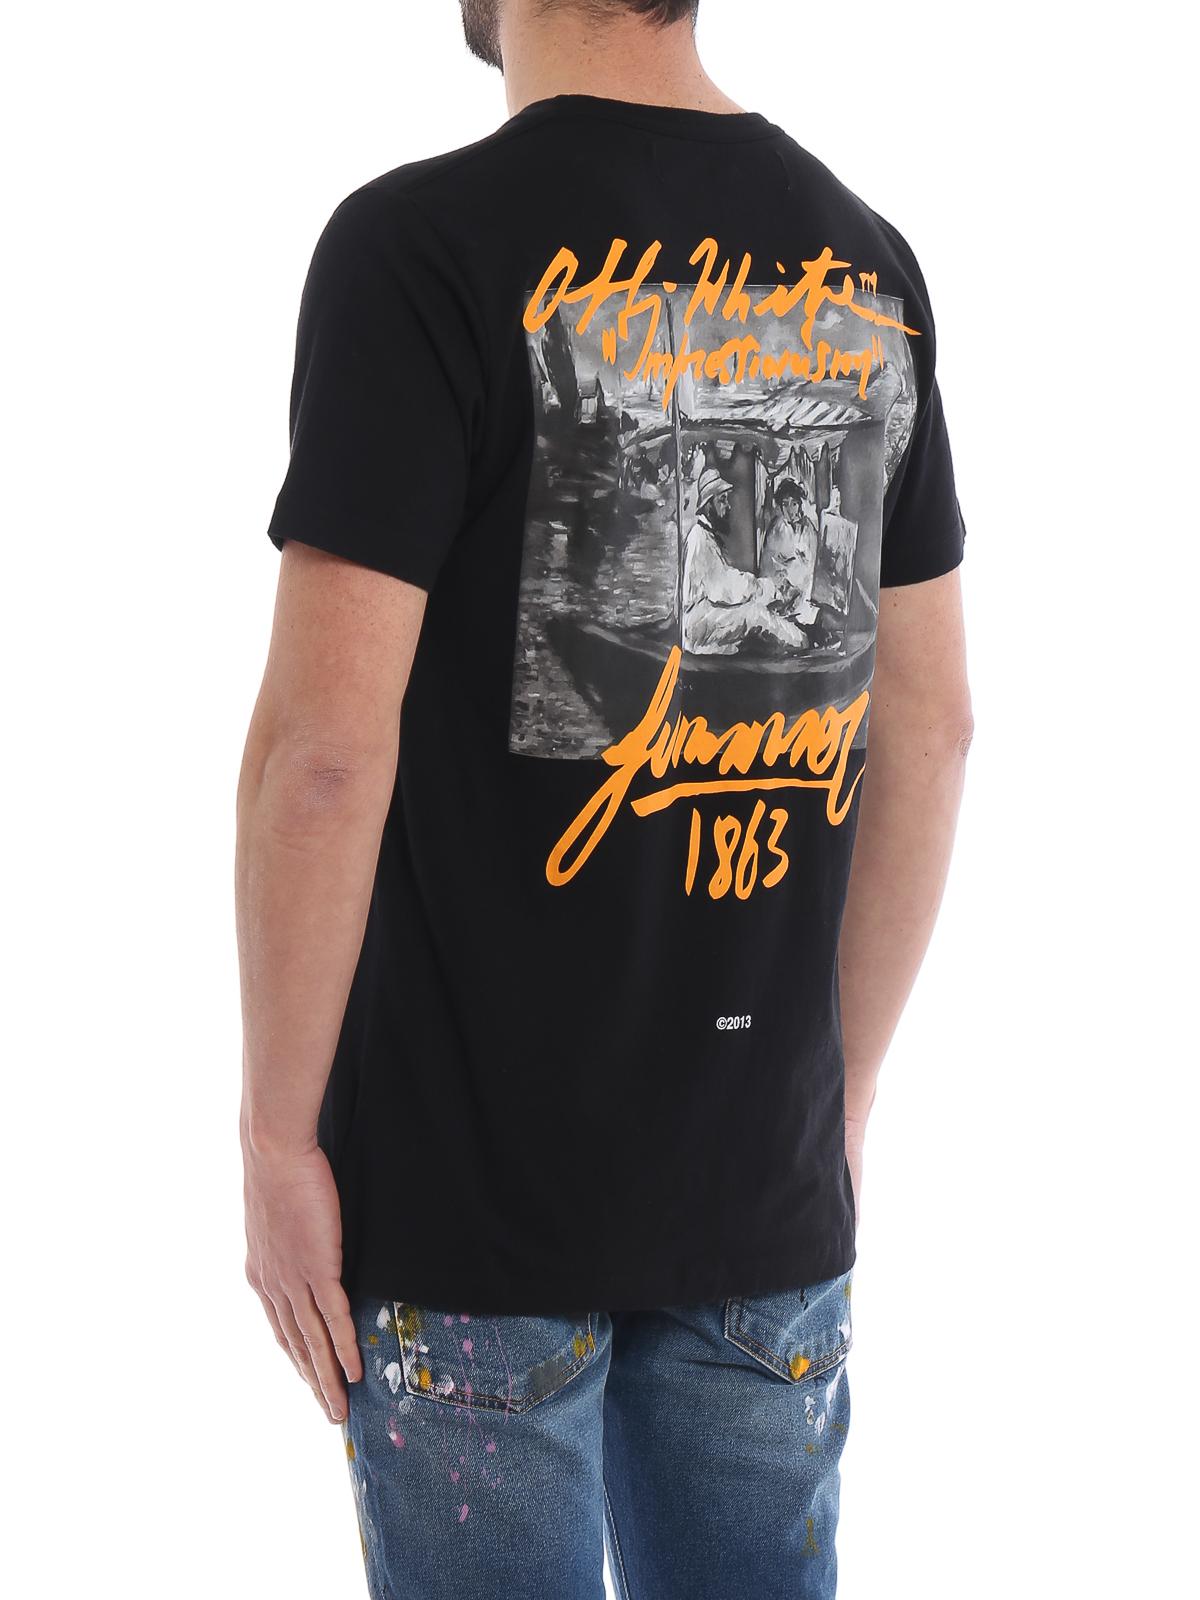 be1cca76cde Off-White - Impressionism short sleeve black slim Tee - t-shirts ...